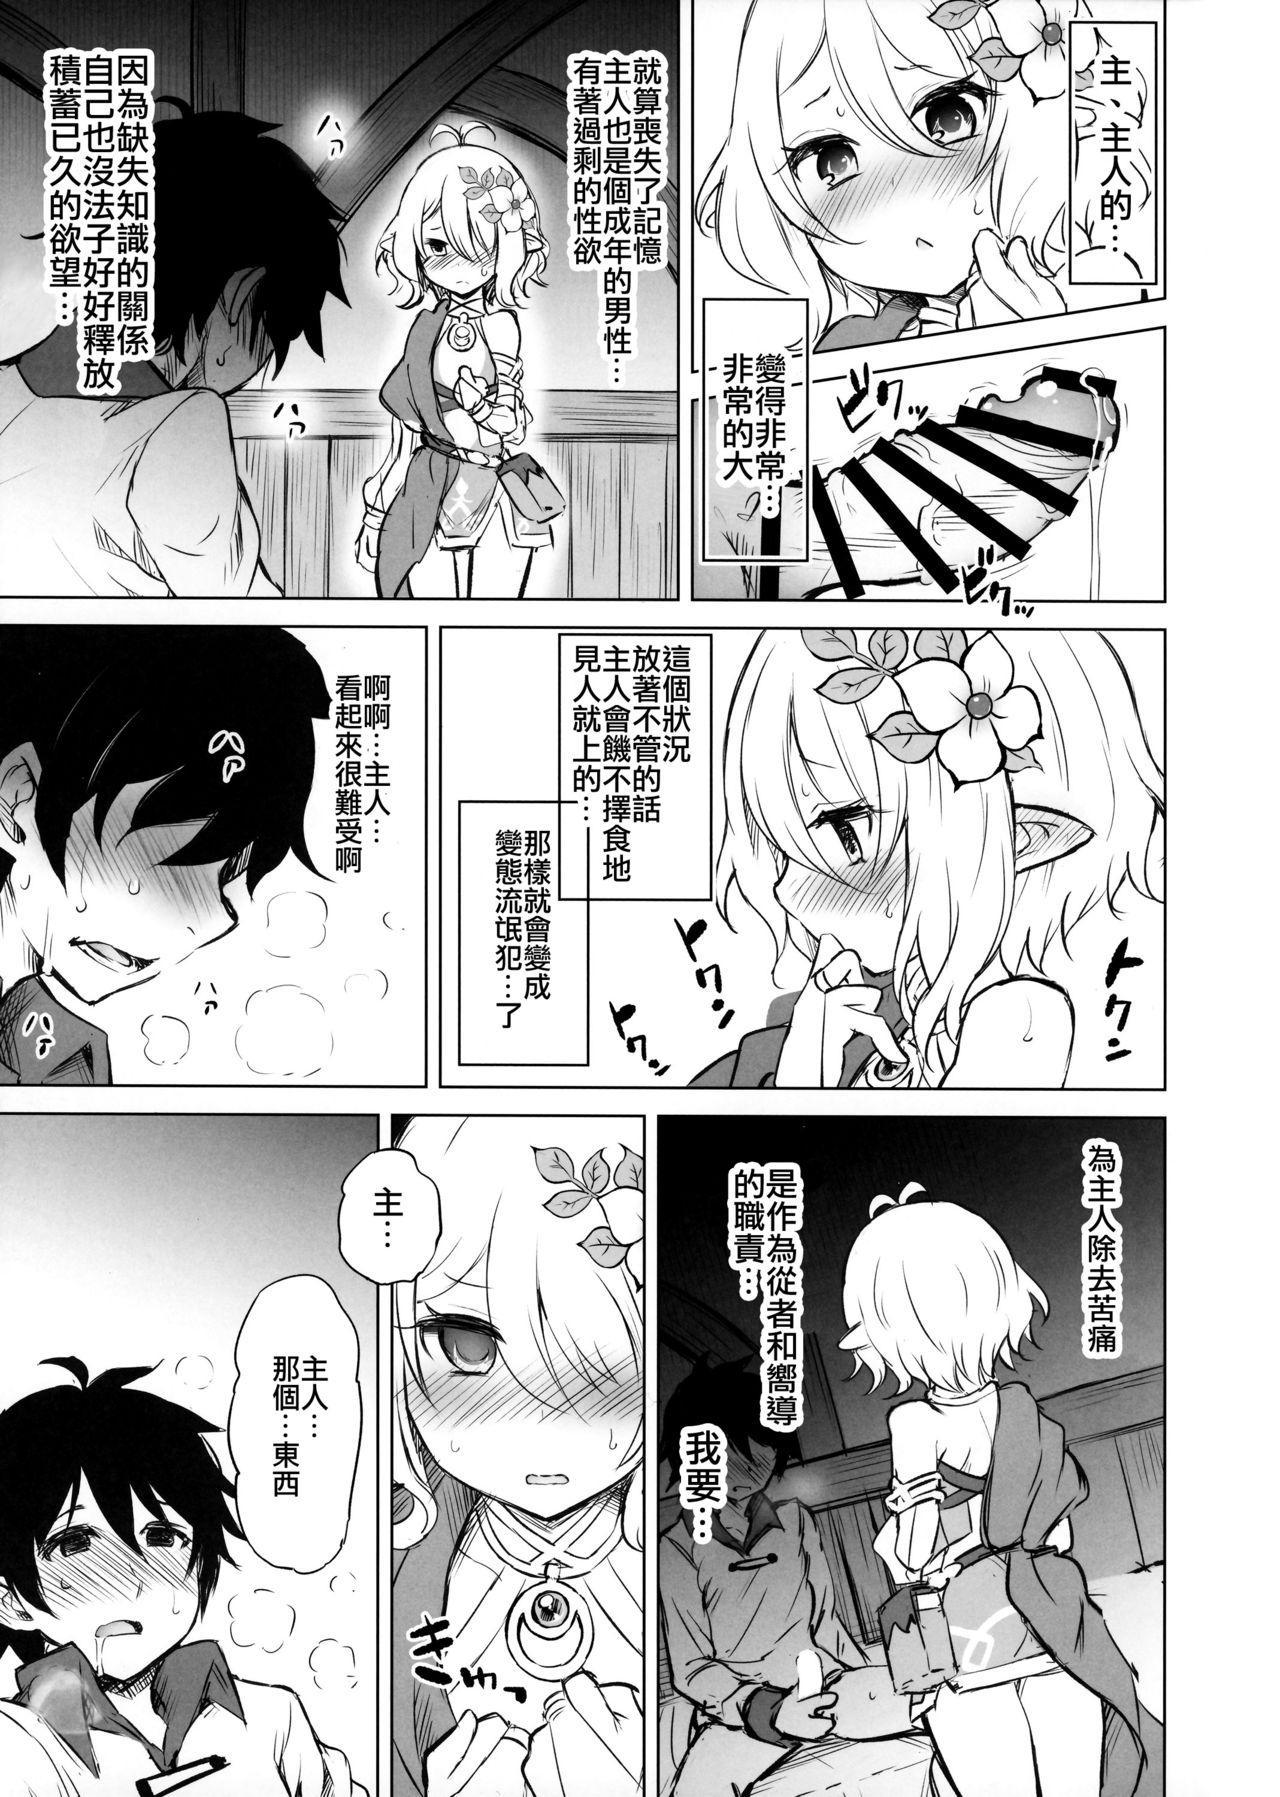 Kokkoro-chan to Connect Shitai!! 6